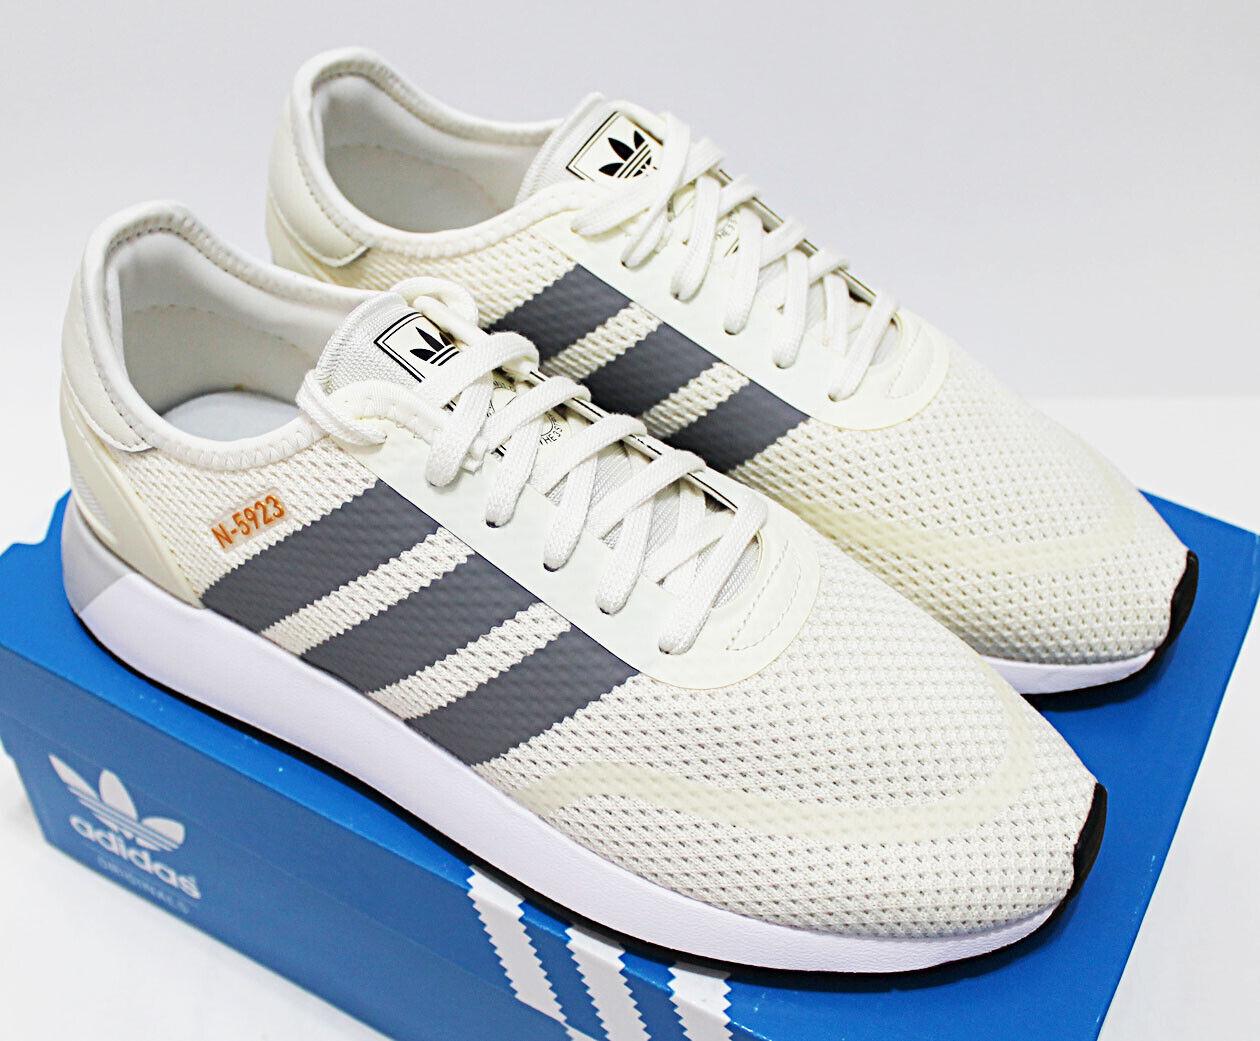 4c4087cc108 $90 NIB ADIDAS N-5923 Men's Cream-White-Grey Low Sneakers Trainers running  shoes